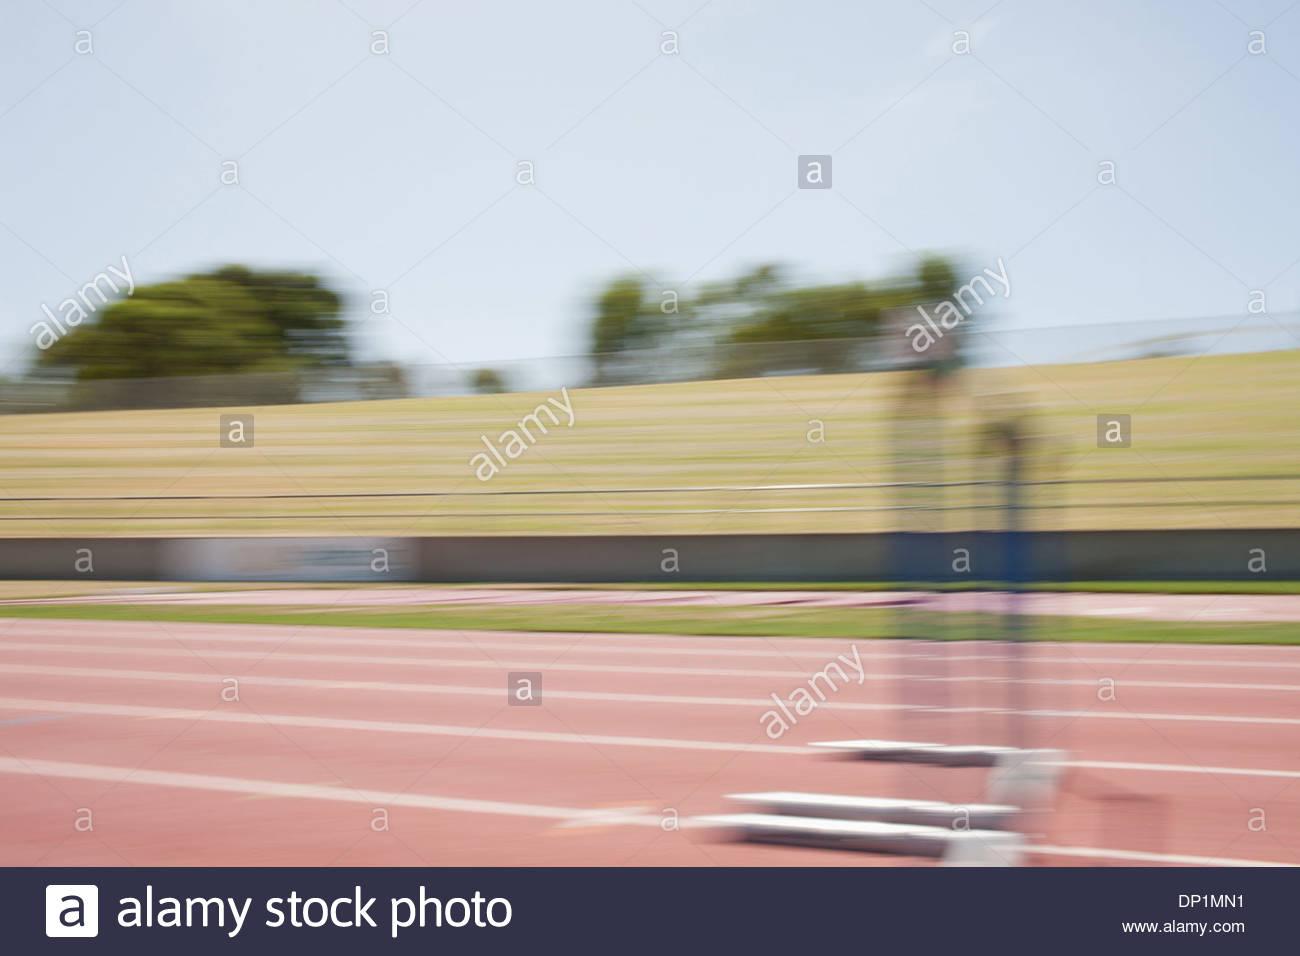 Racetrack - Stock Image